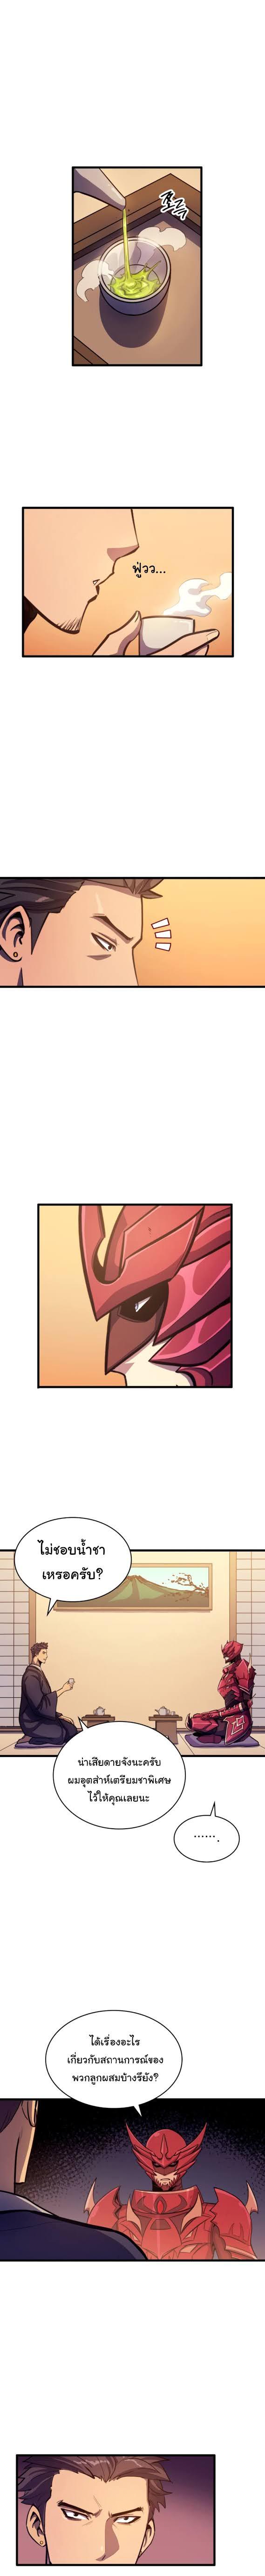 Max Level Returner - หน้า 4